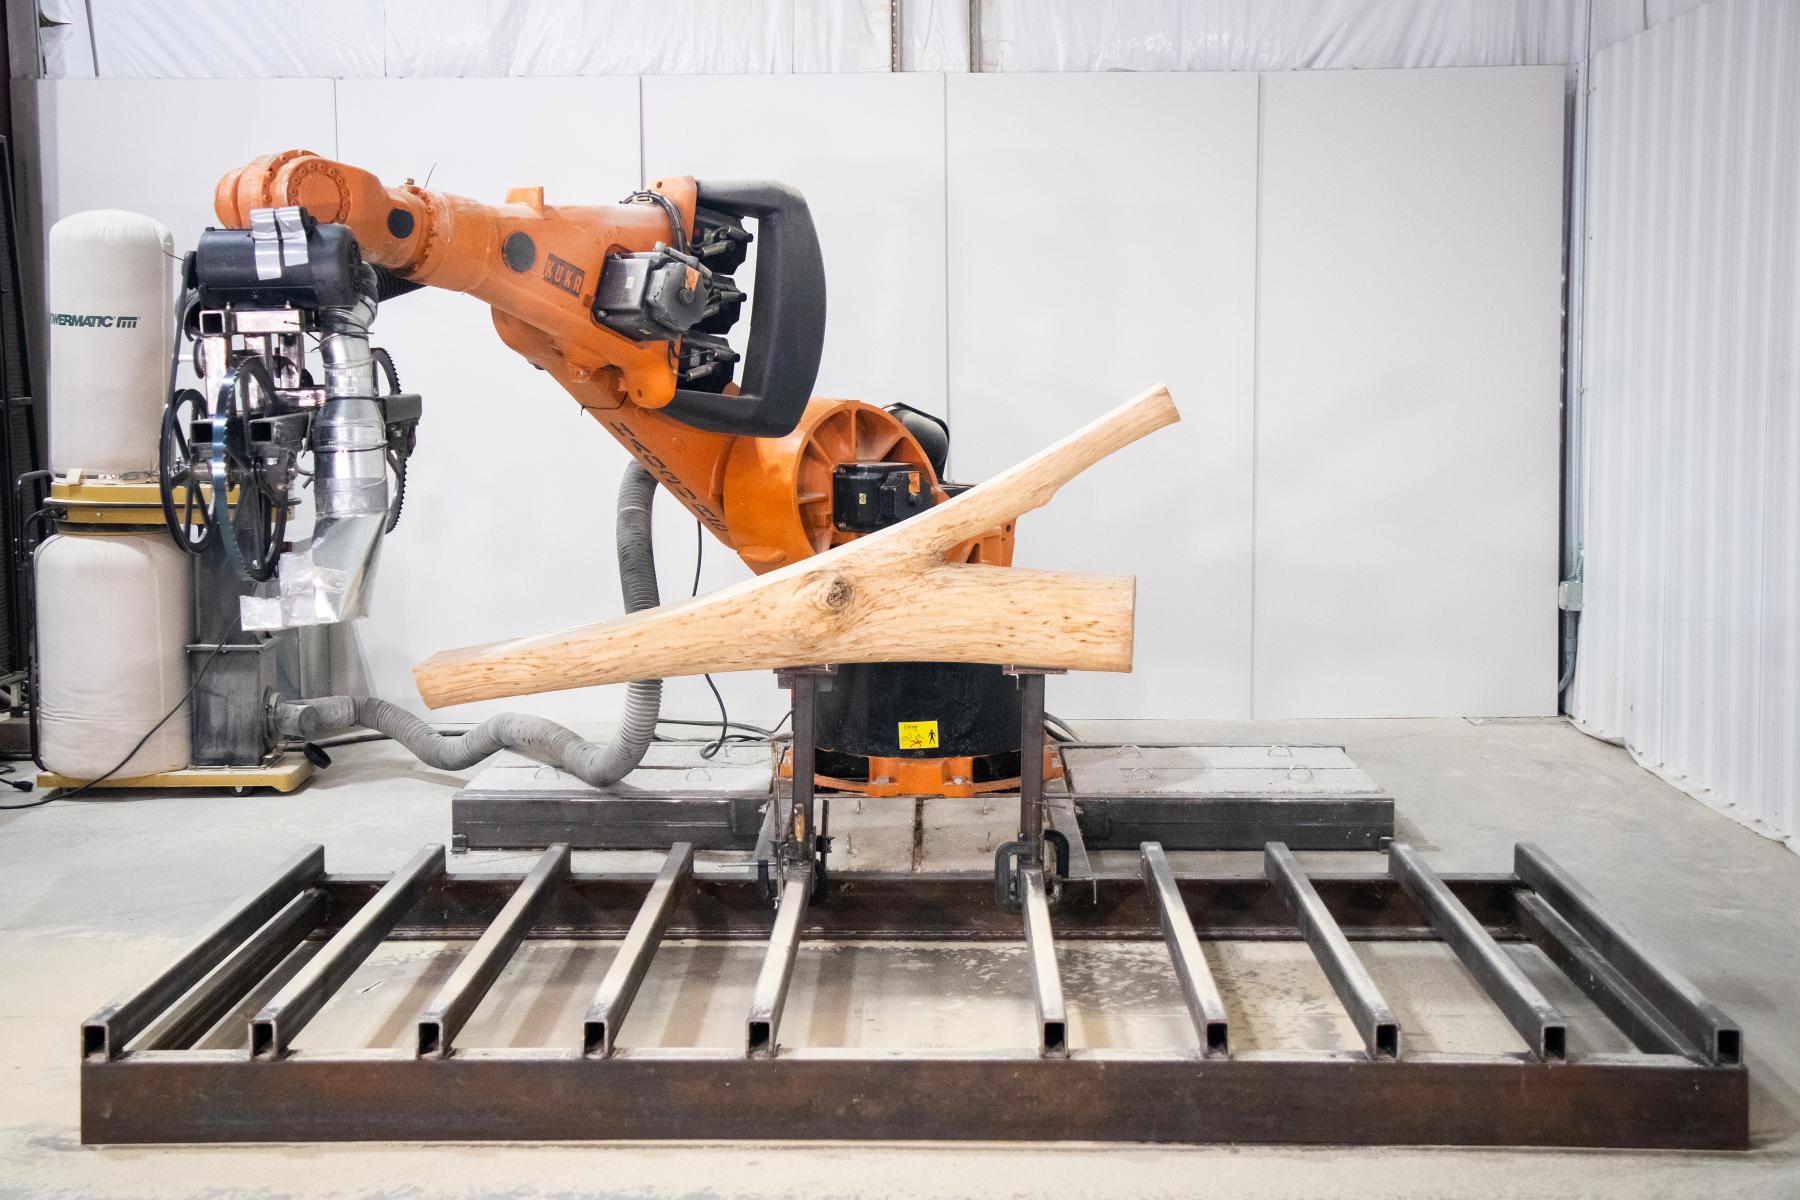 robotic chainsaw arm preparing to cut a log